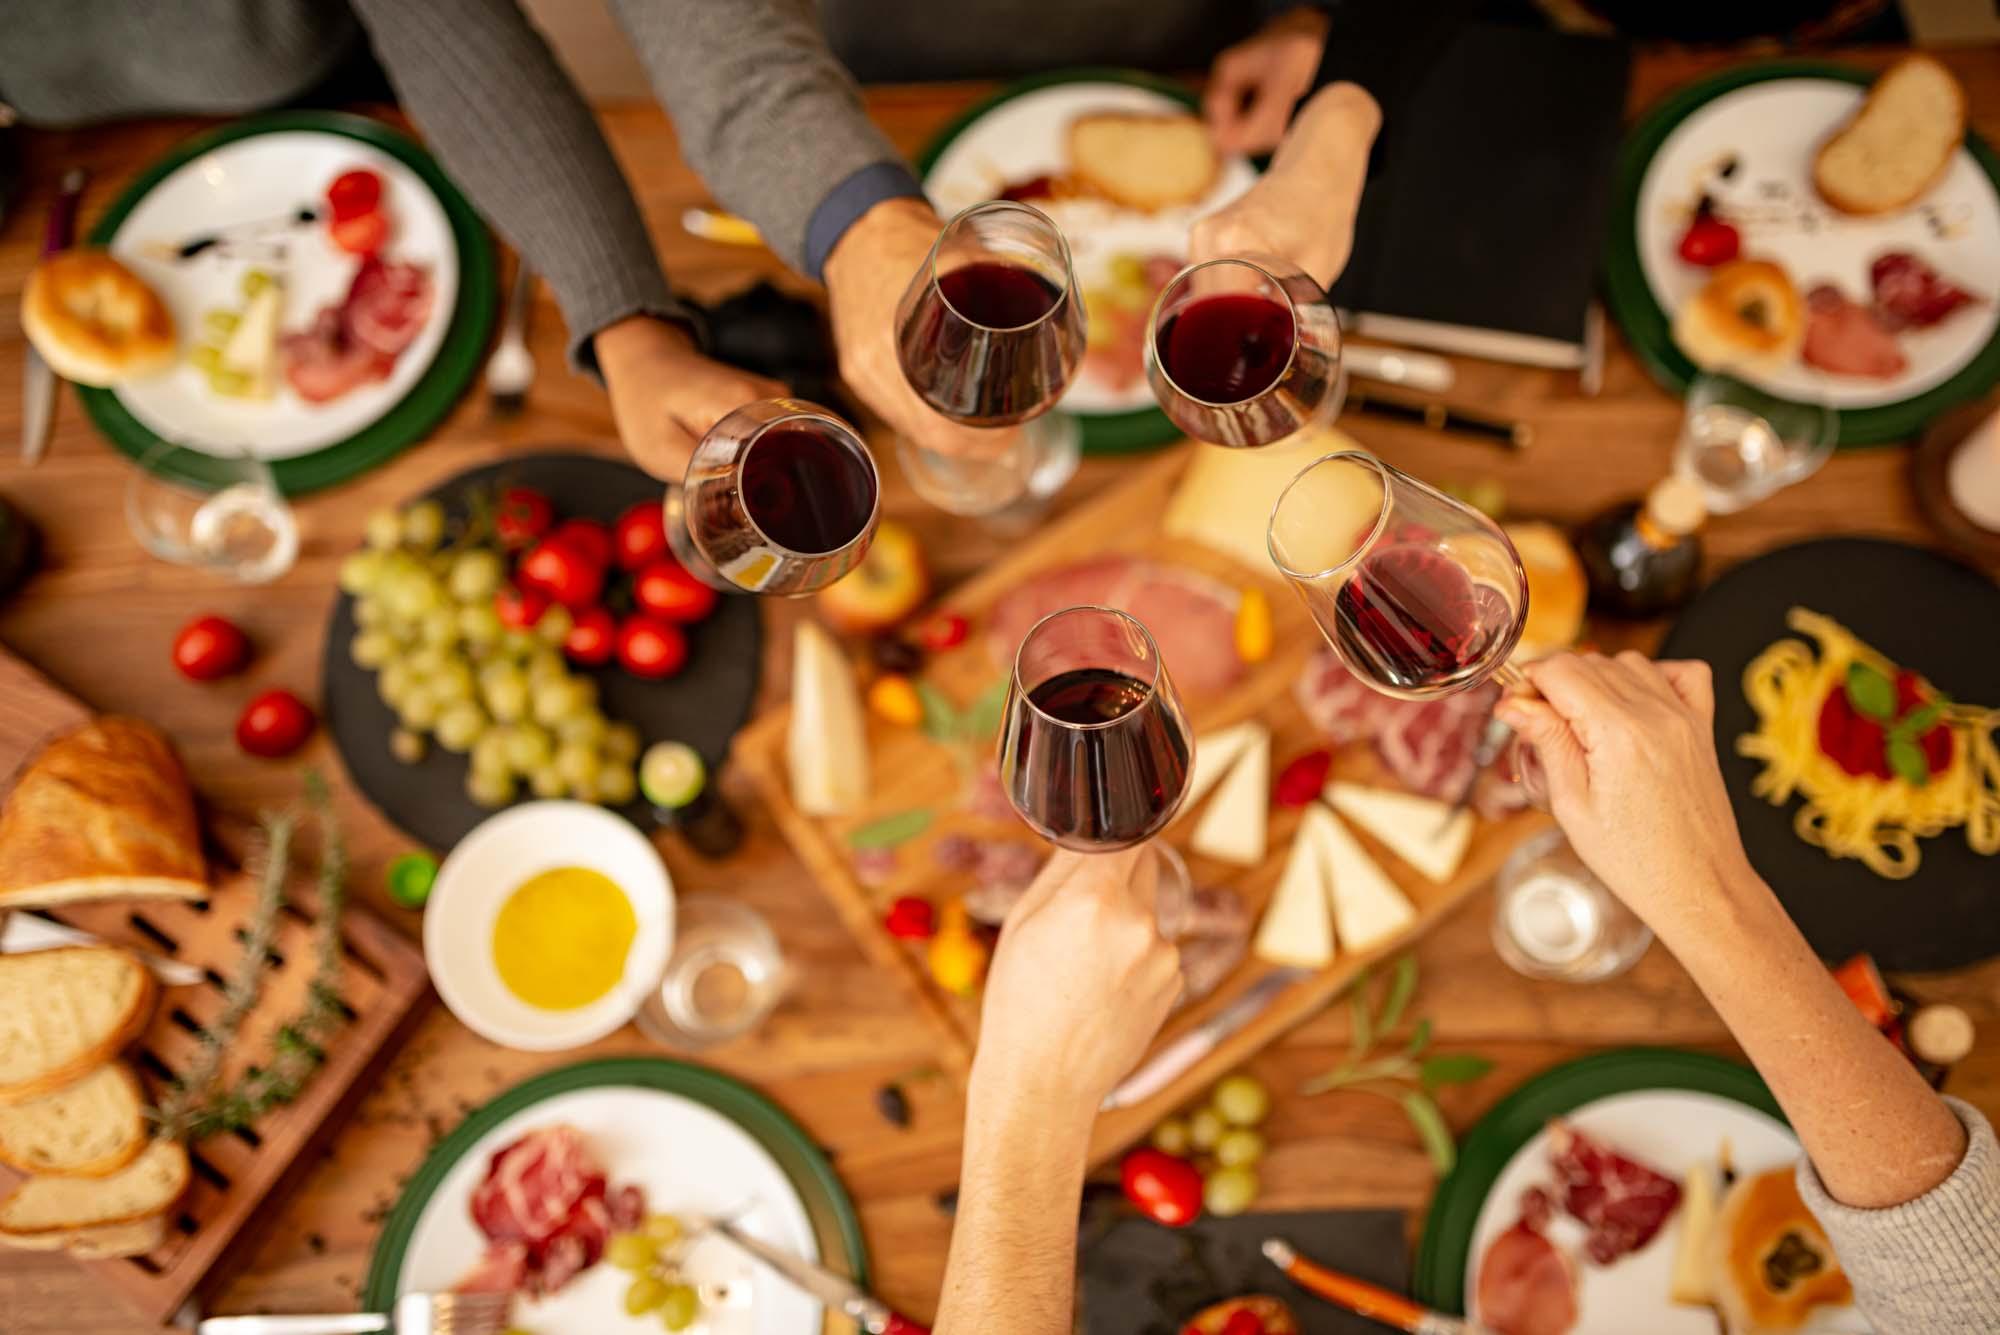 Corsi Di Cucina Formazione Manageriale a Verona